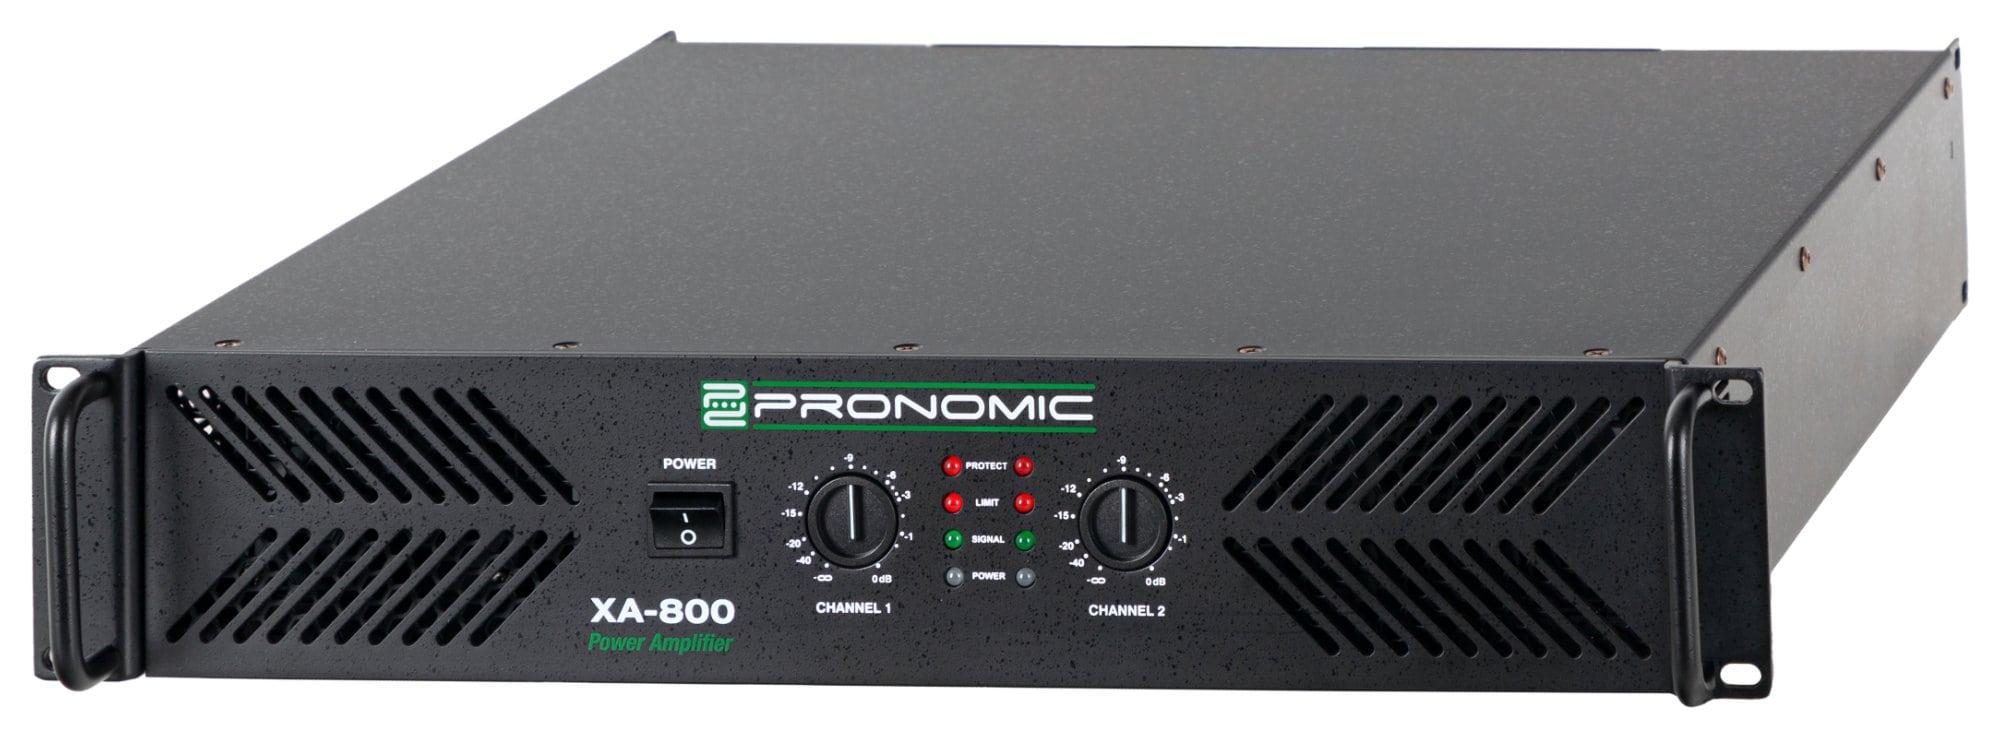 Pronomic XA 800 Endstufe 2x 1900 Watt